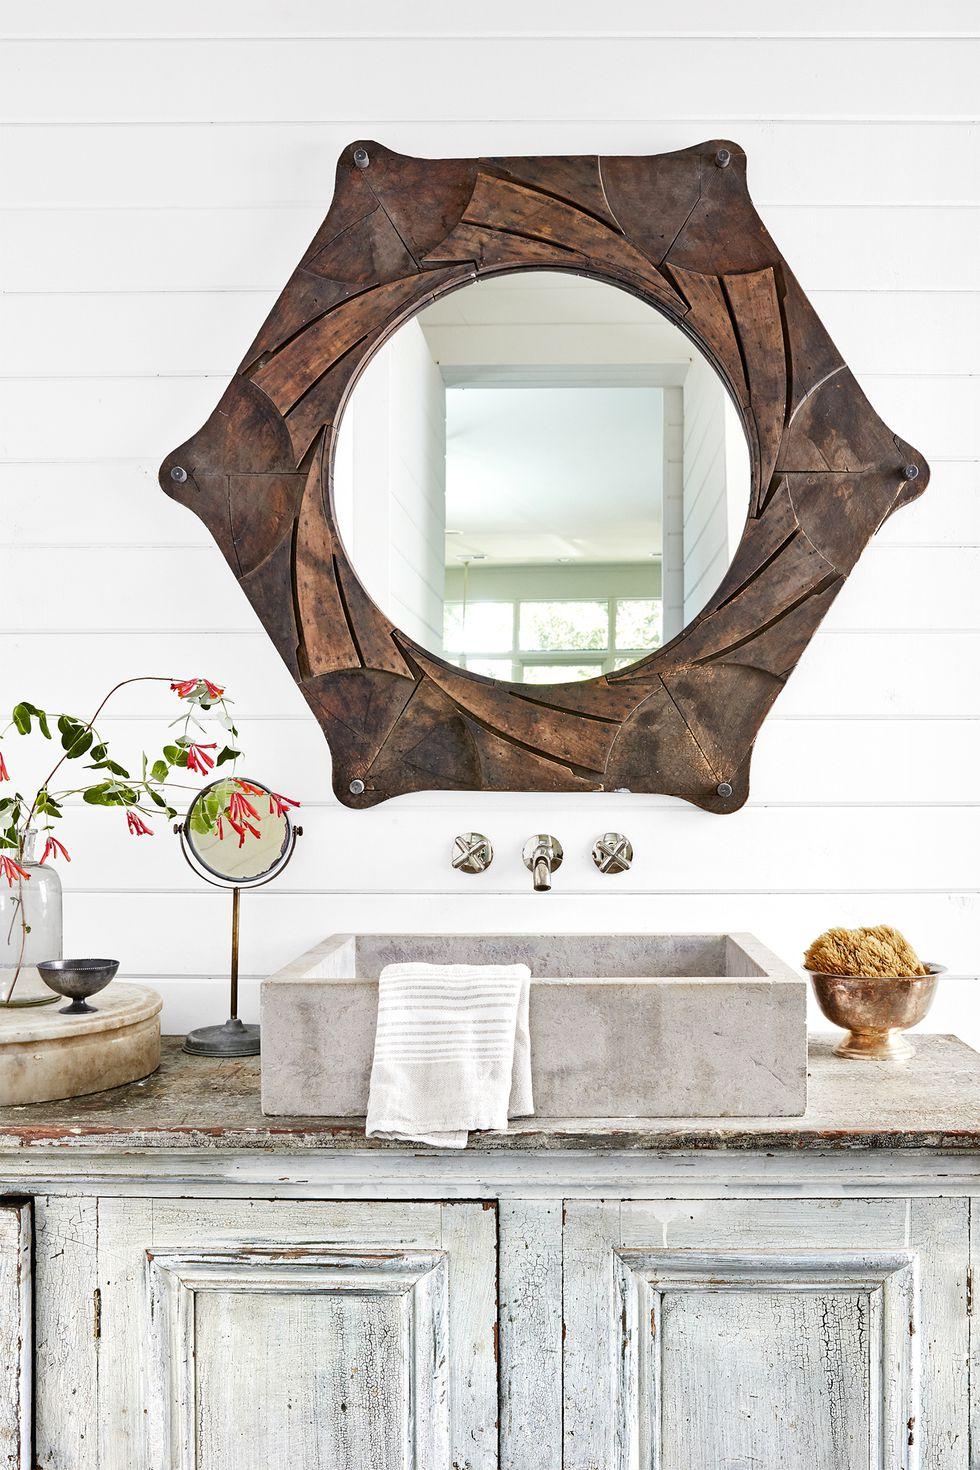 lofty-intentions-bathroom-1018-1542138244.jpg